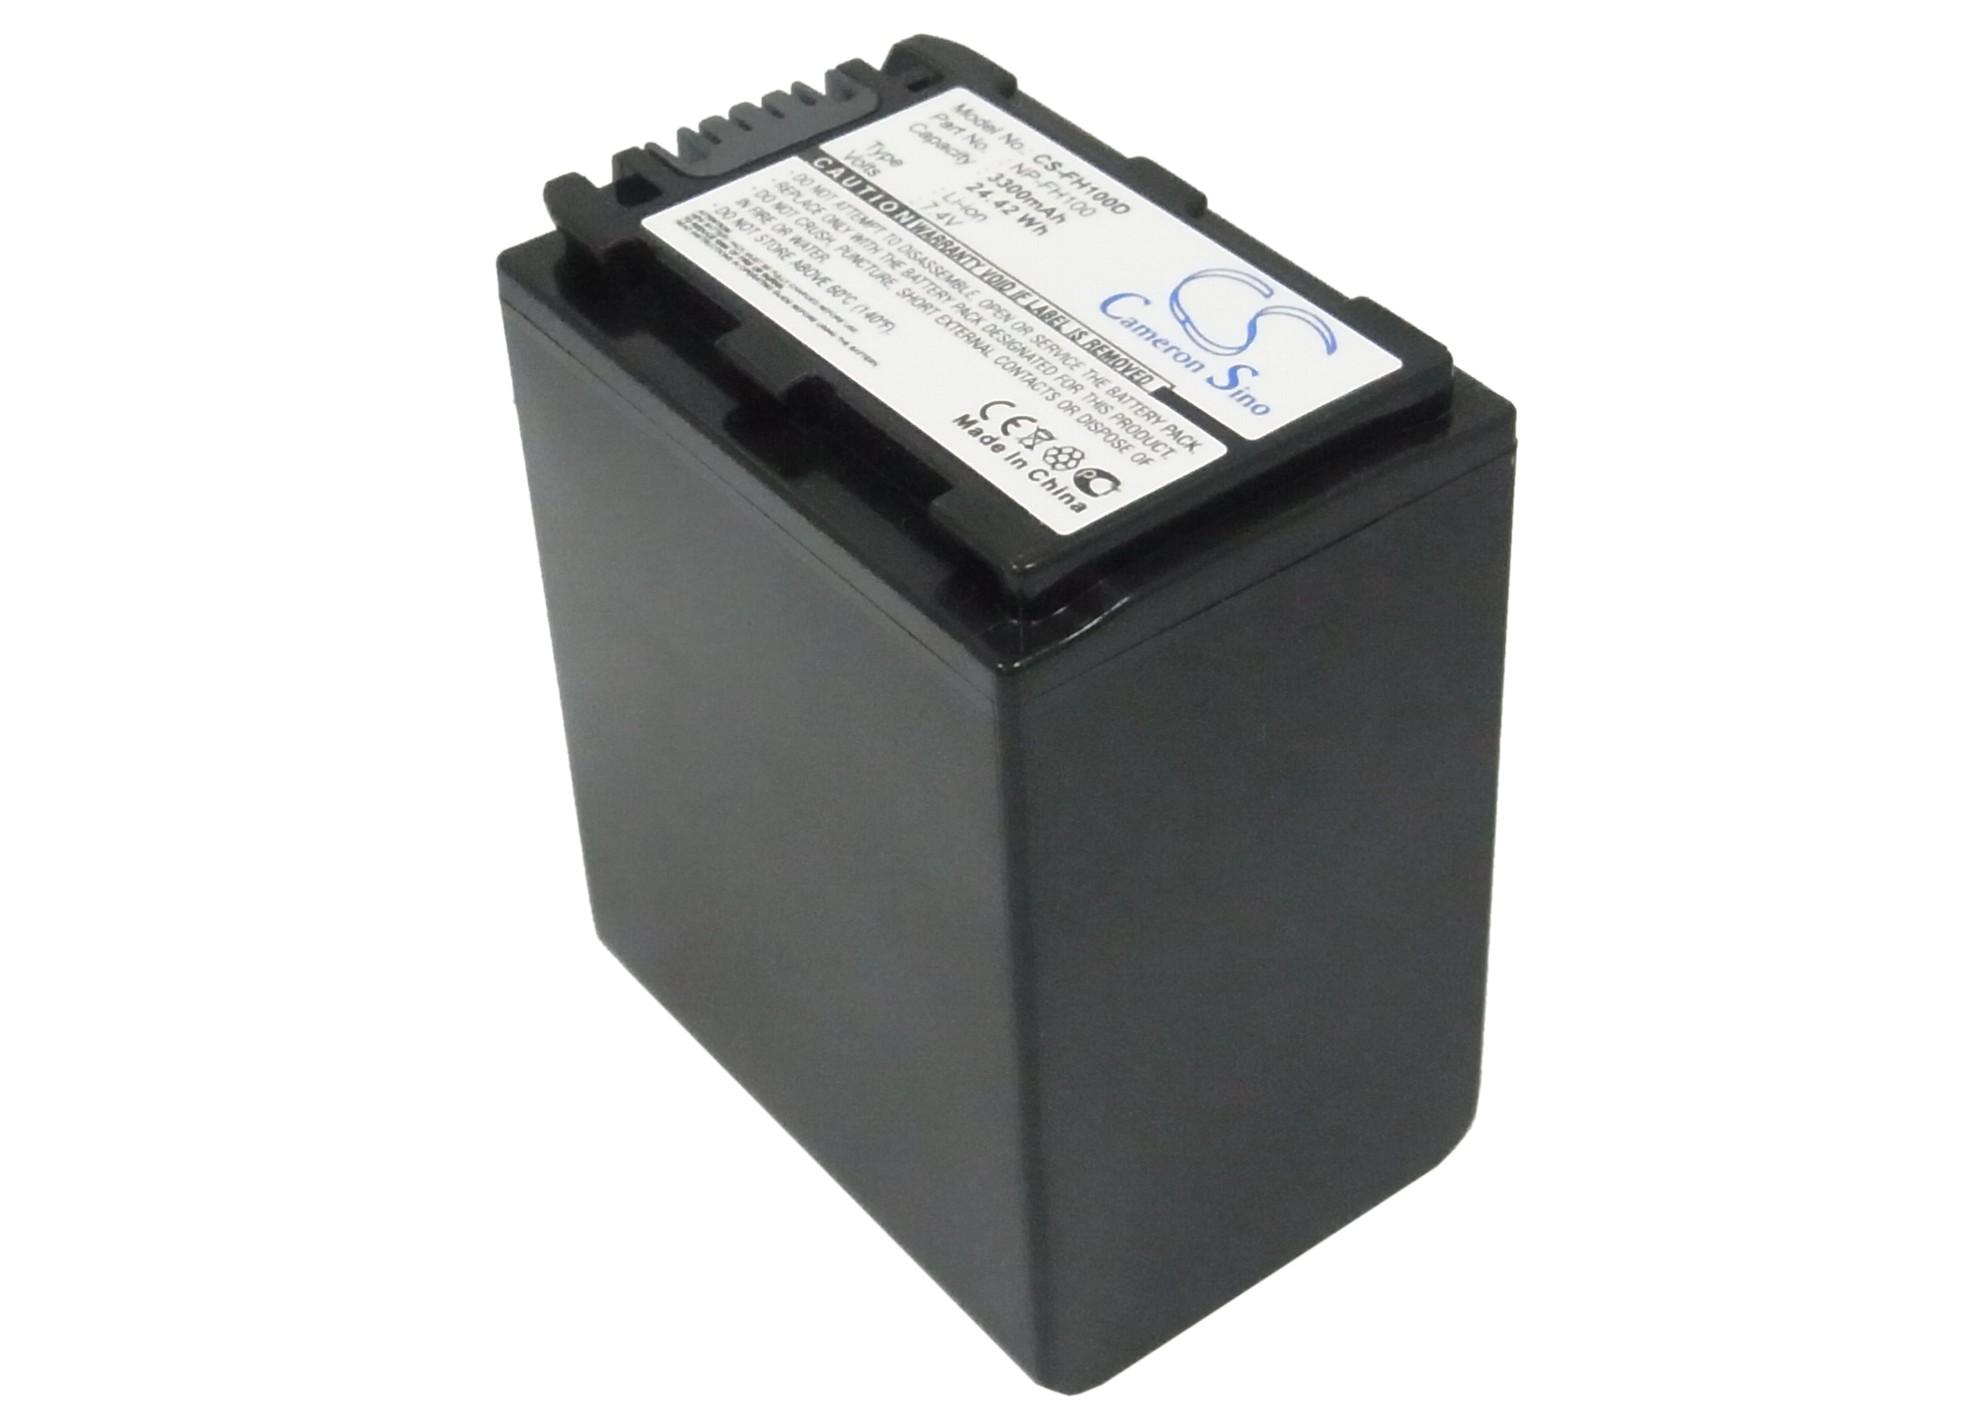 Cameron Sino baterie do kamer a fotoaparátů pro SONY DCR-SR90E 7.4V Li-ion 3300mAh tmavě šedá - neoriginální